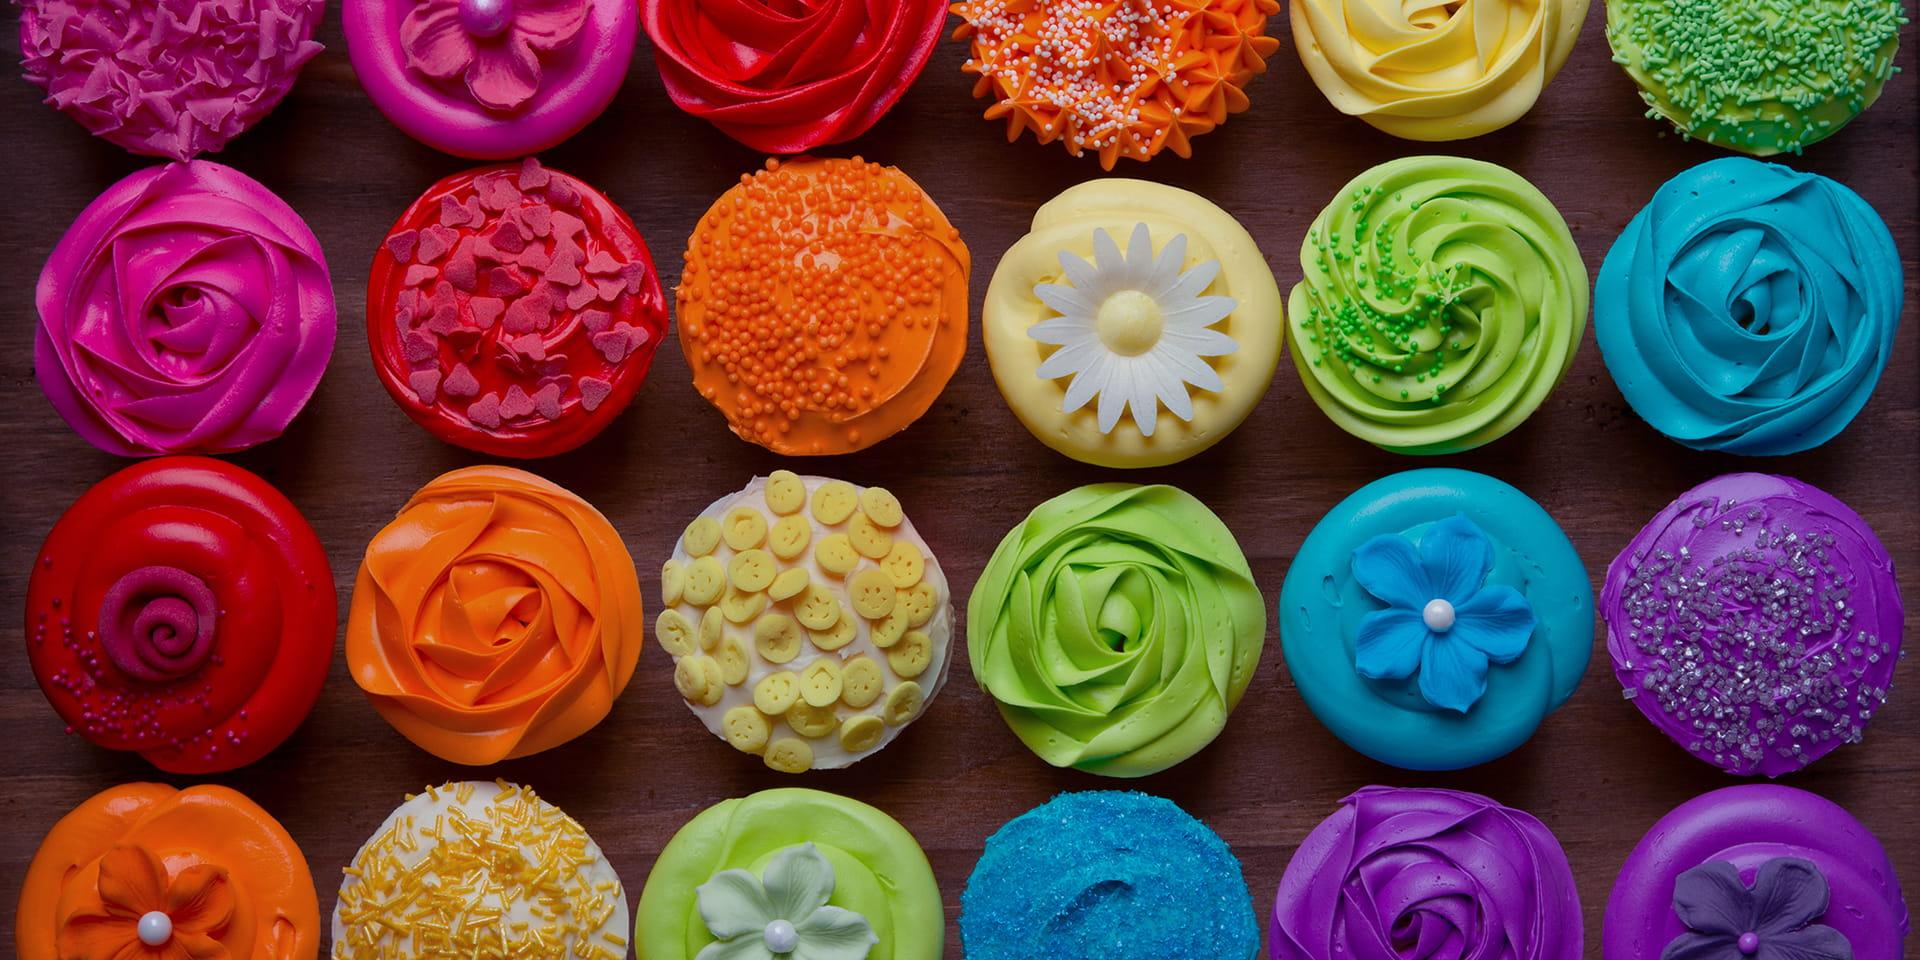 My Cake Decorating Gr Facebook : My Cake Decorating iProspect